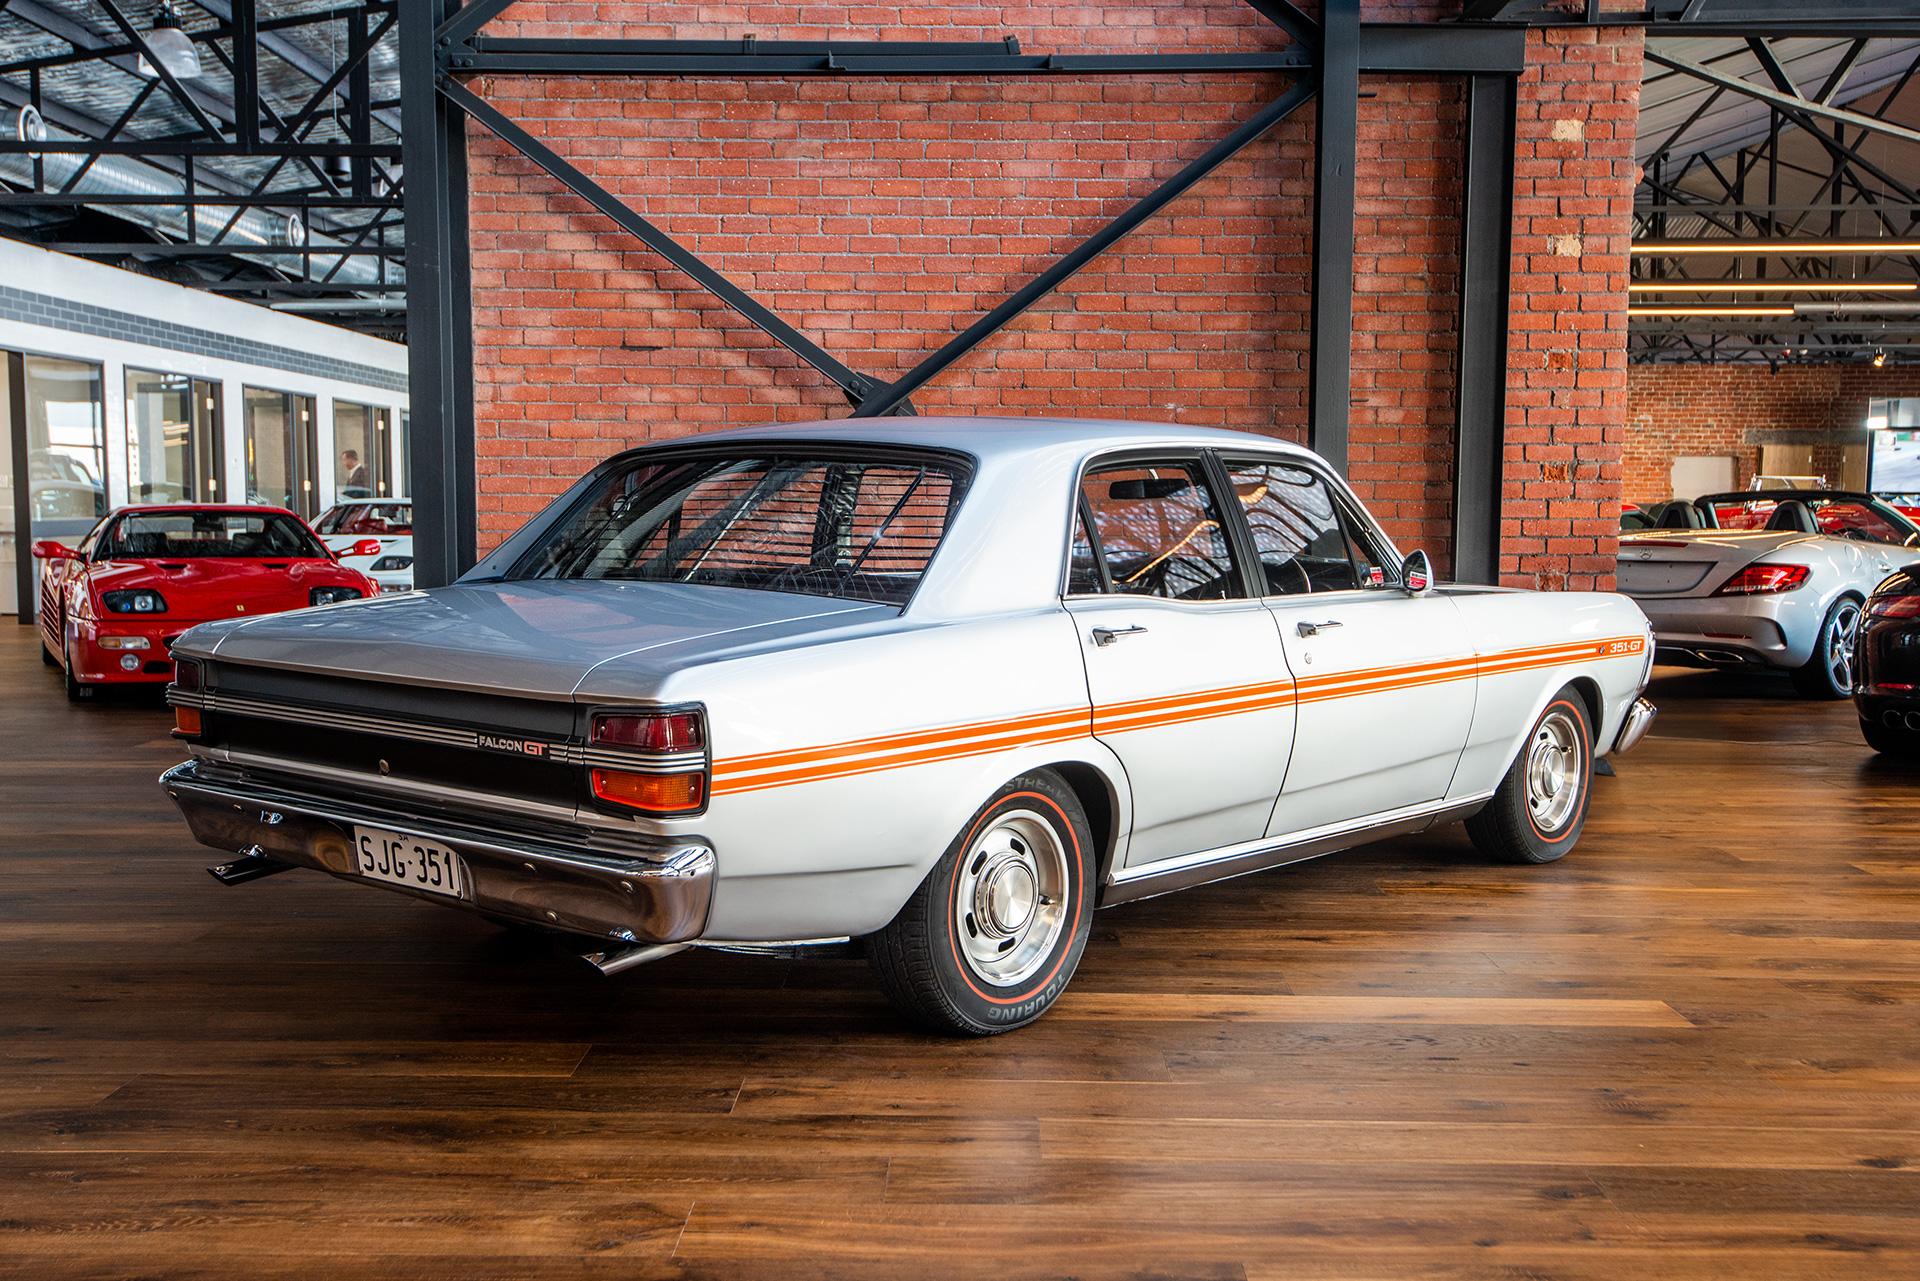 1970 Ford Fairmont Xy - Gt Tribute - Richmonds